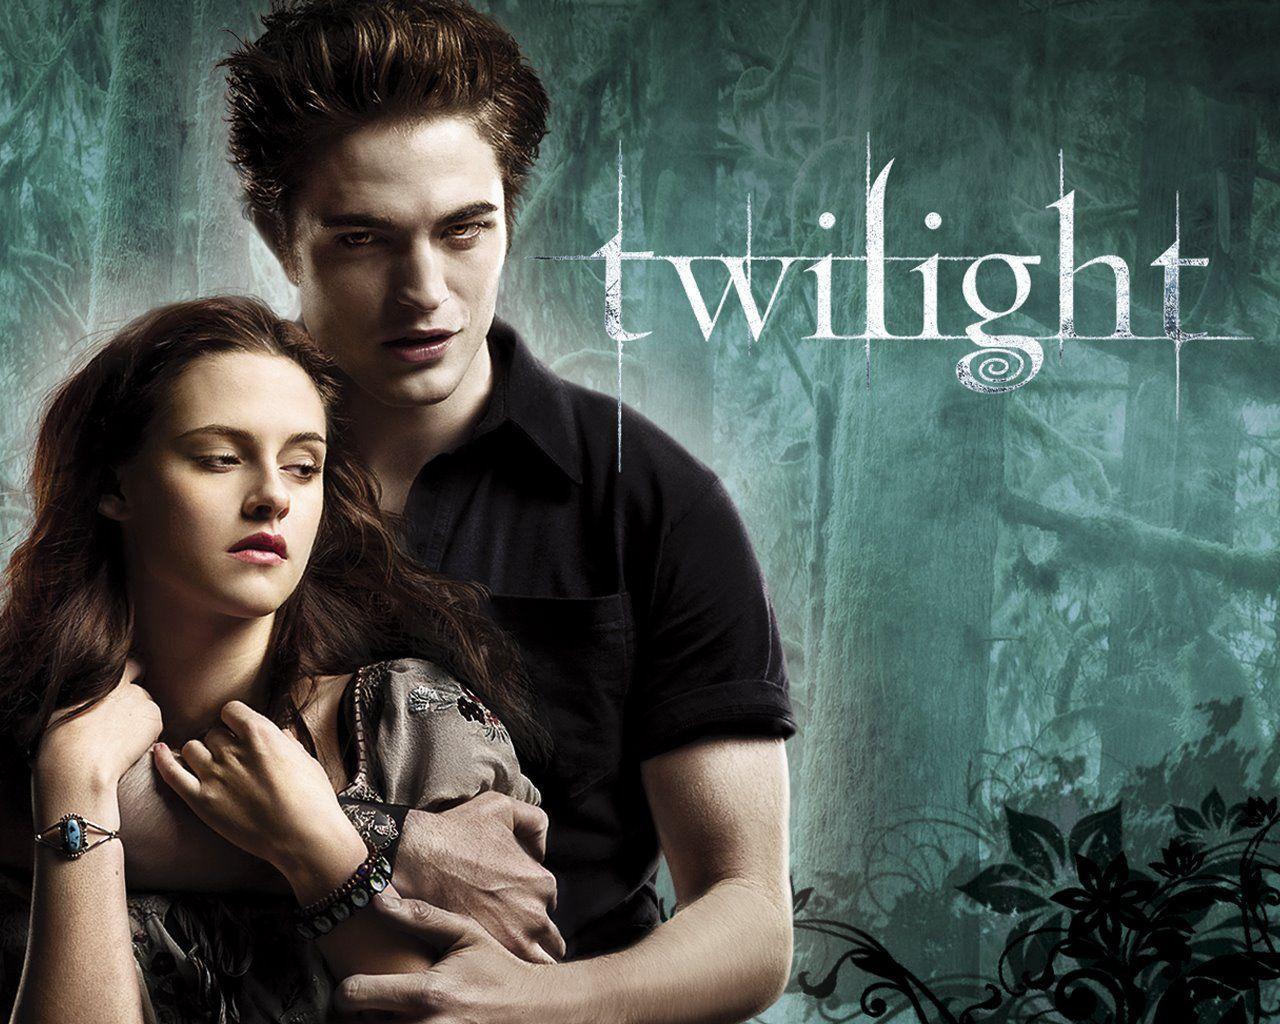 Twilight Twilight Movie Twilight 2008 Twilight Film